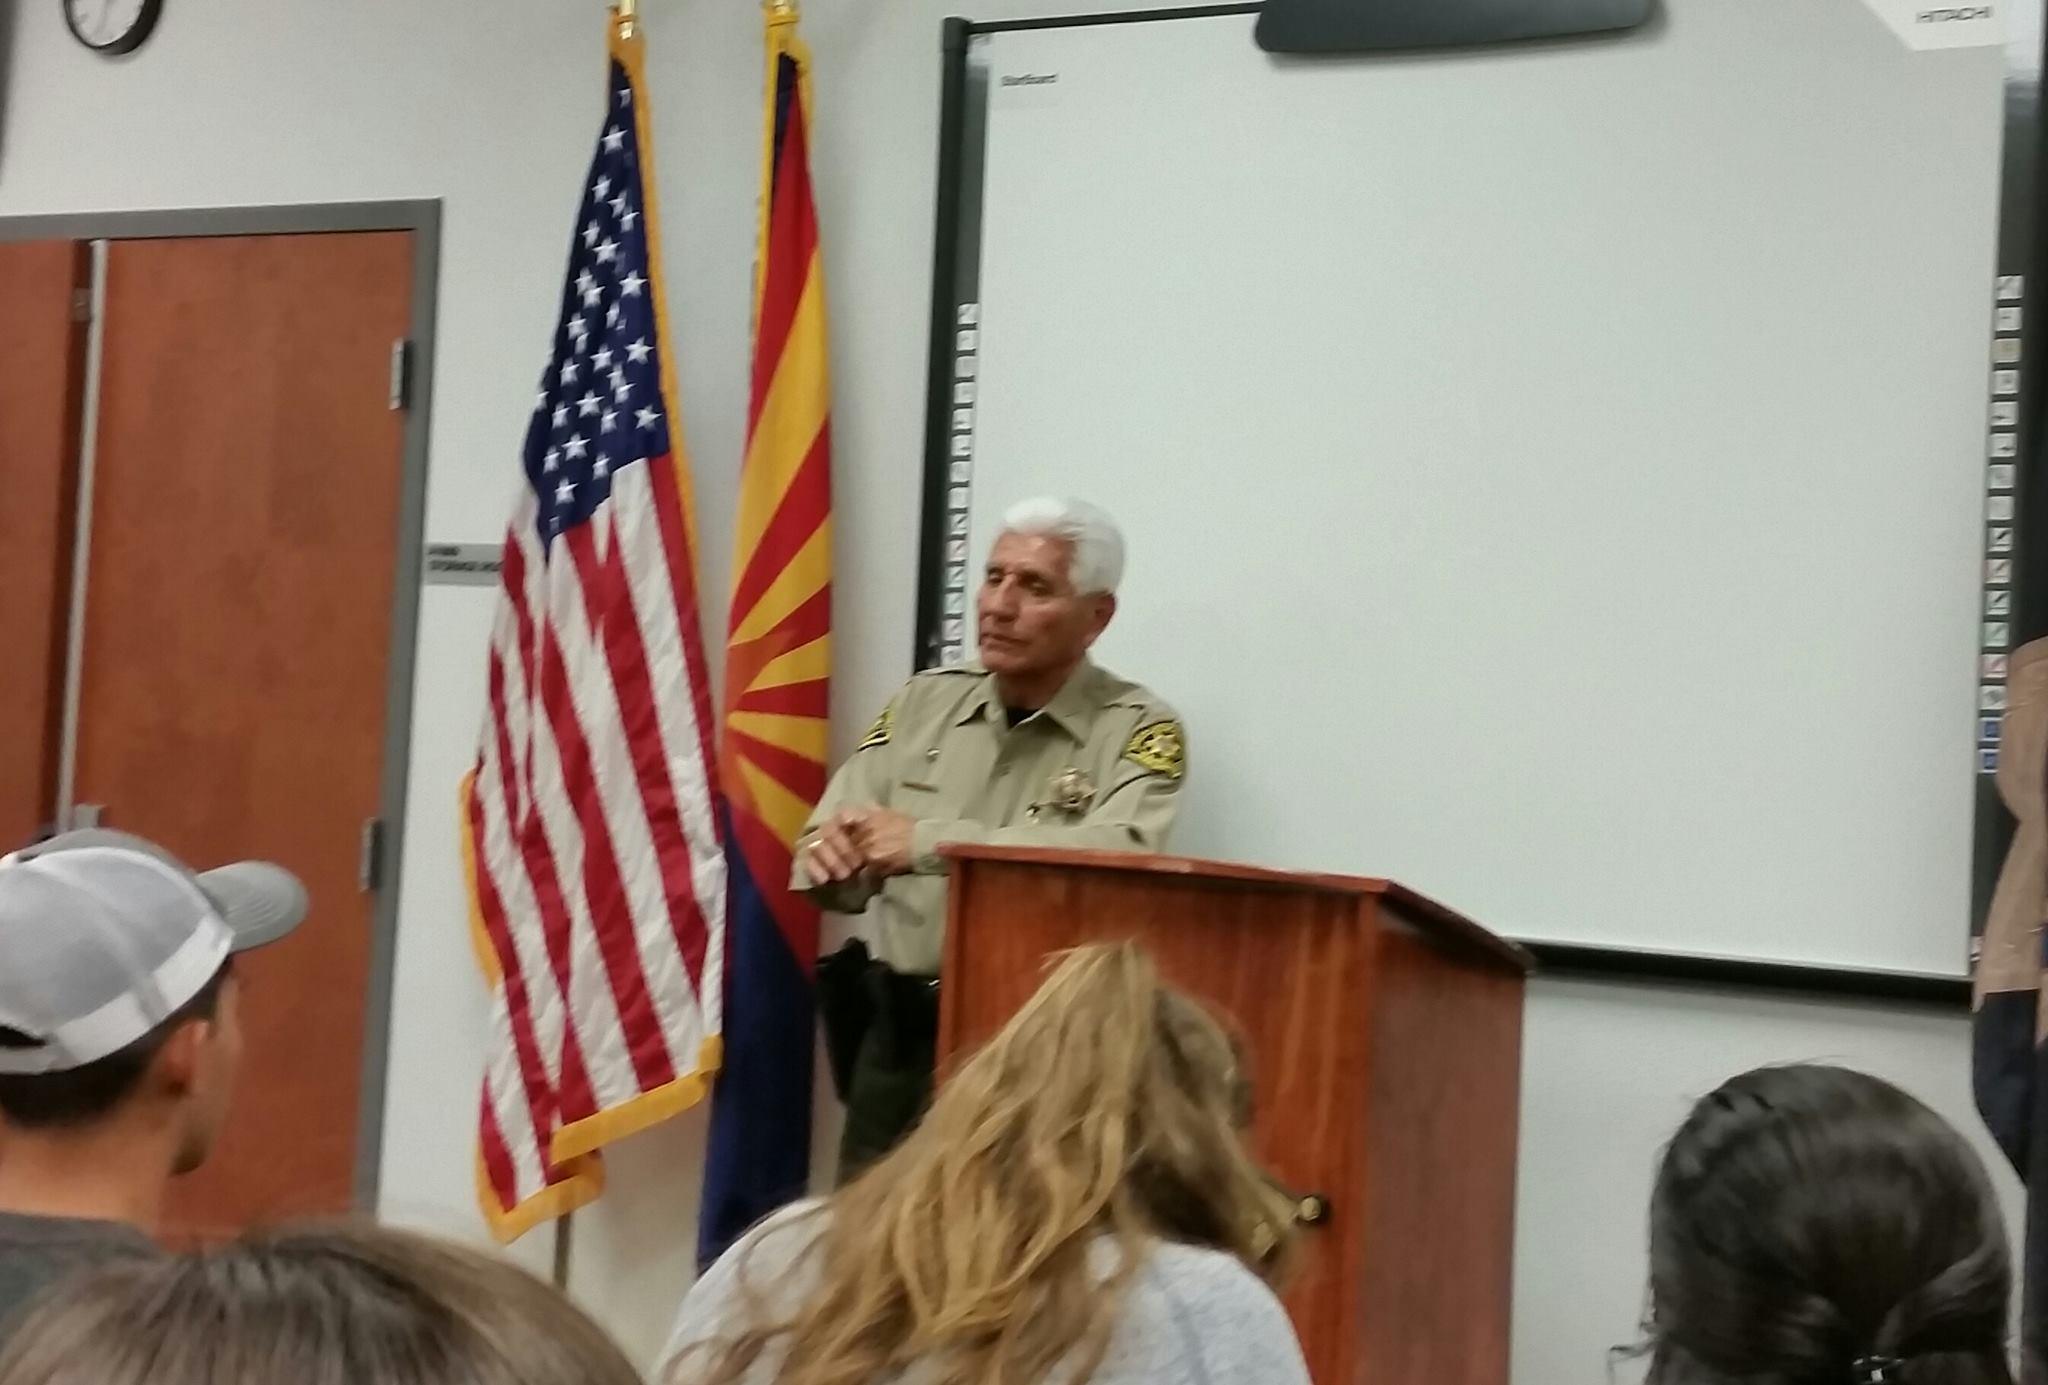 common ground border event 2018 4 sheriff tony estrada santa cruz county.jpg